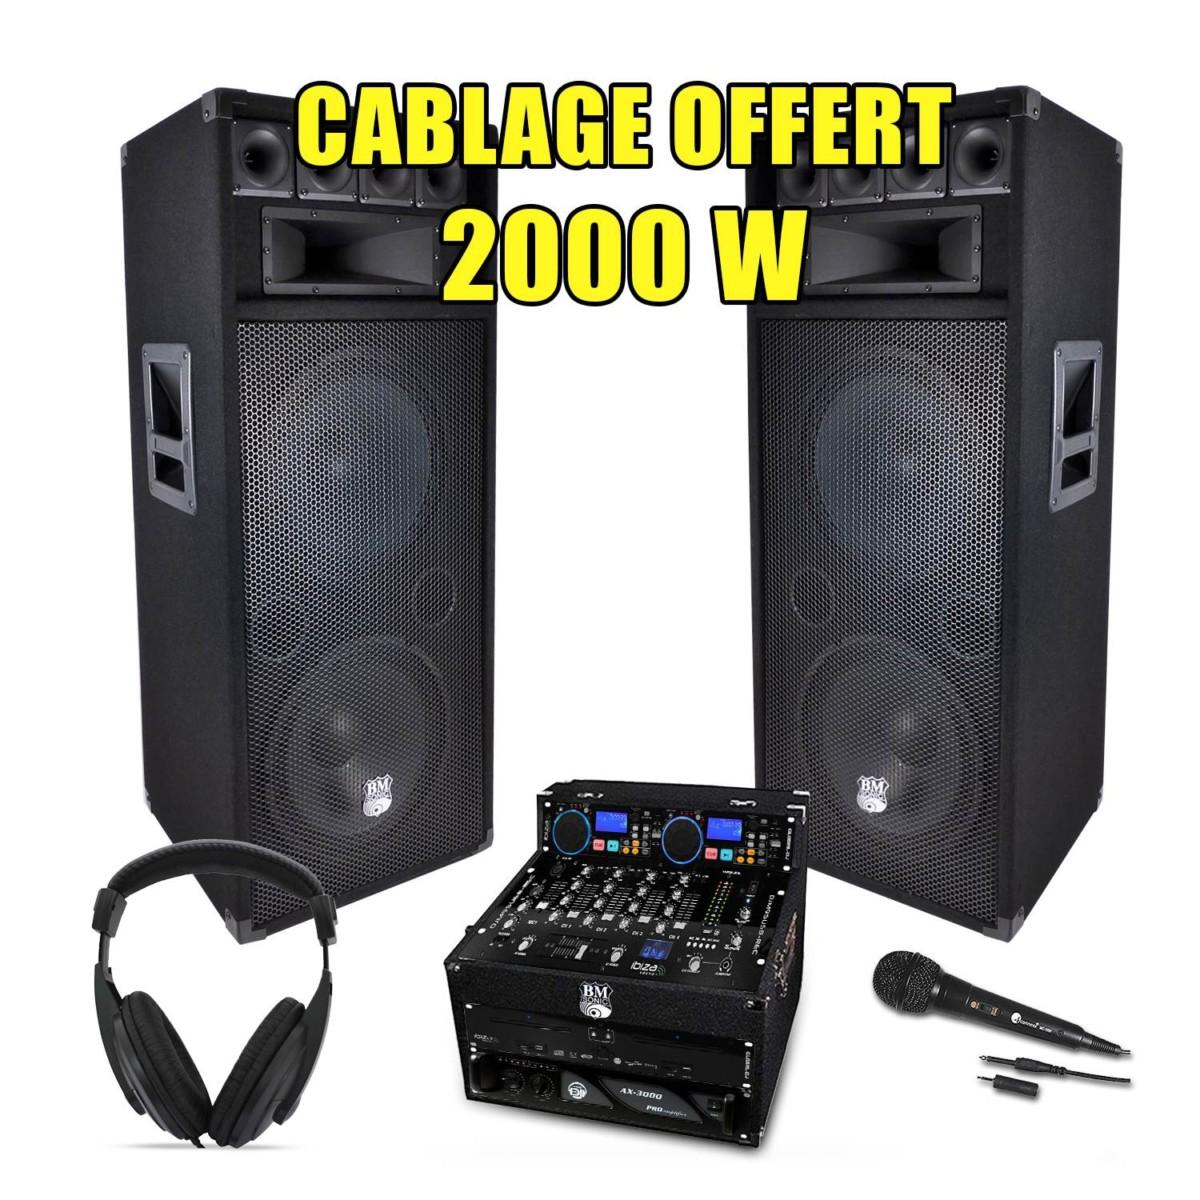 PACK SONO DJ Complet 2000W Ampli Lecteur CD IBIZA